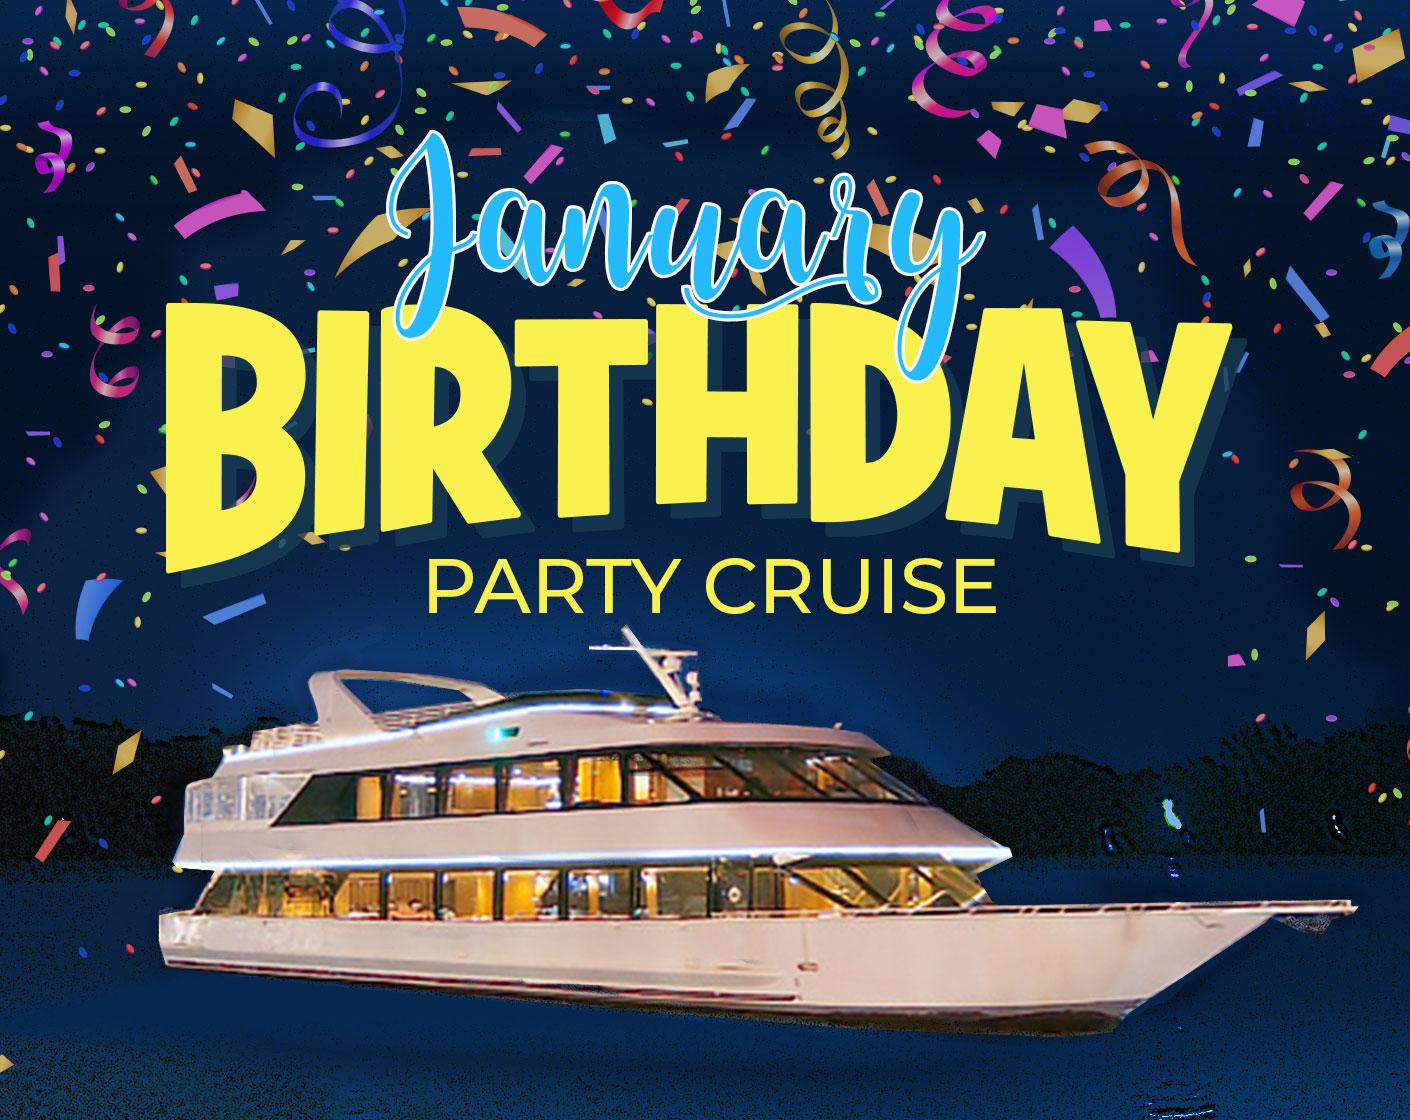 January Birthday Party Cruise